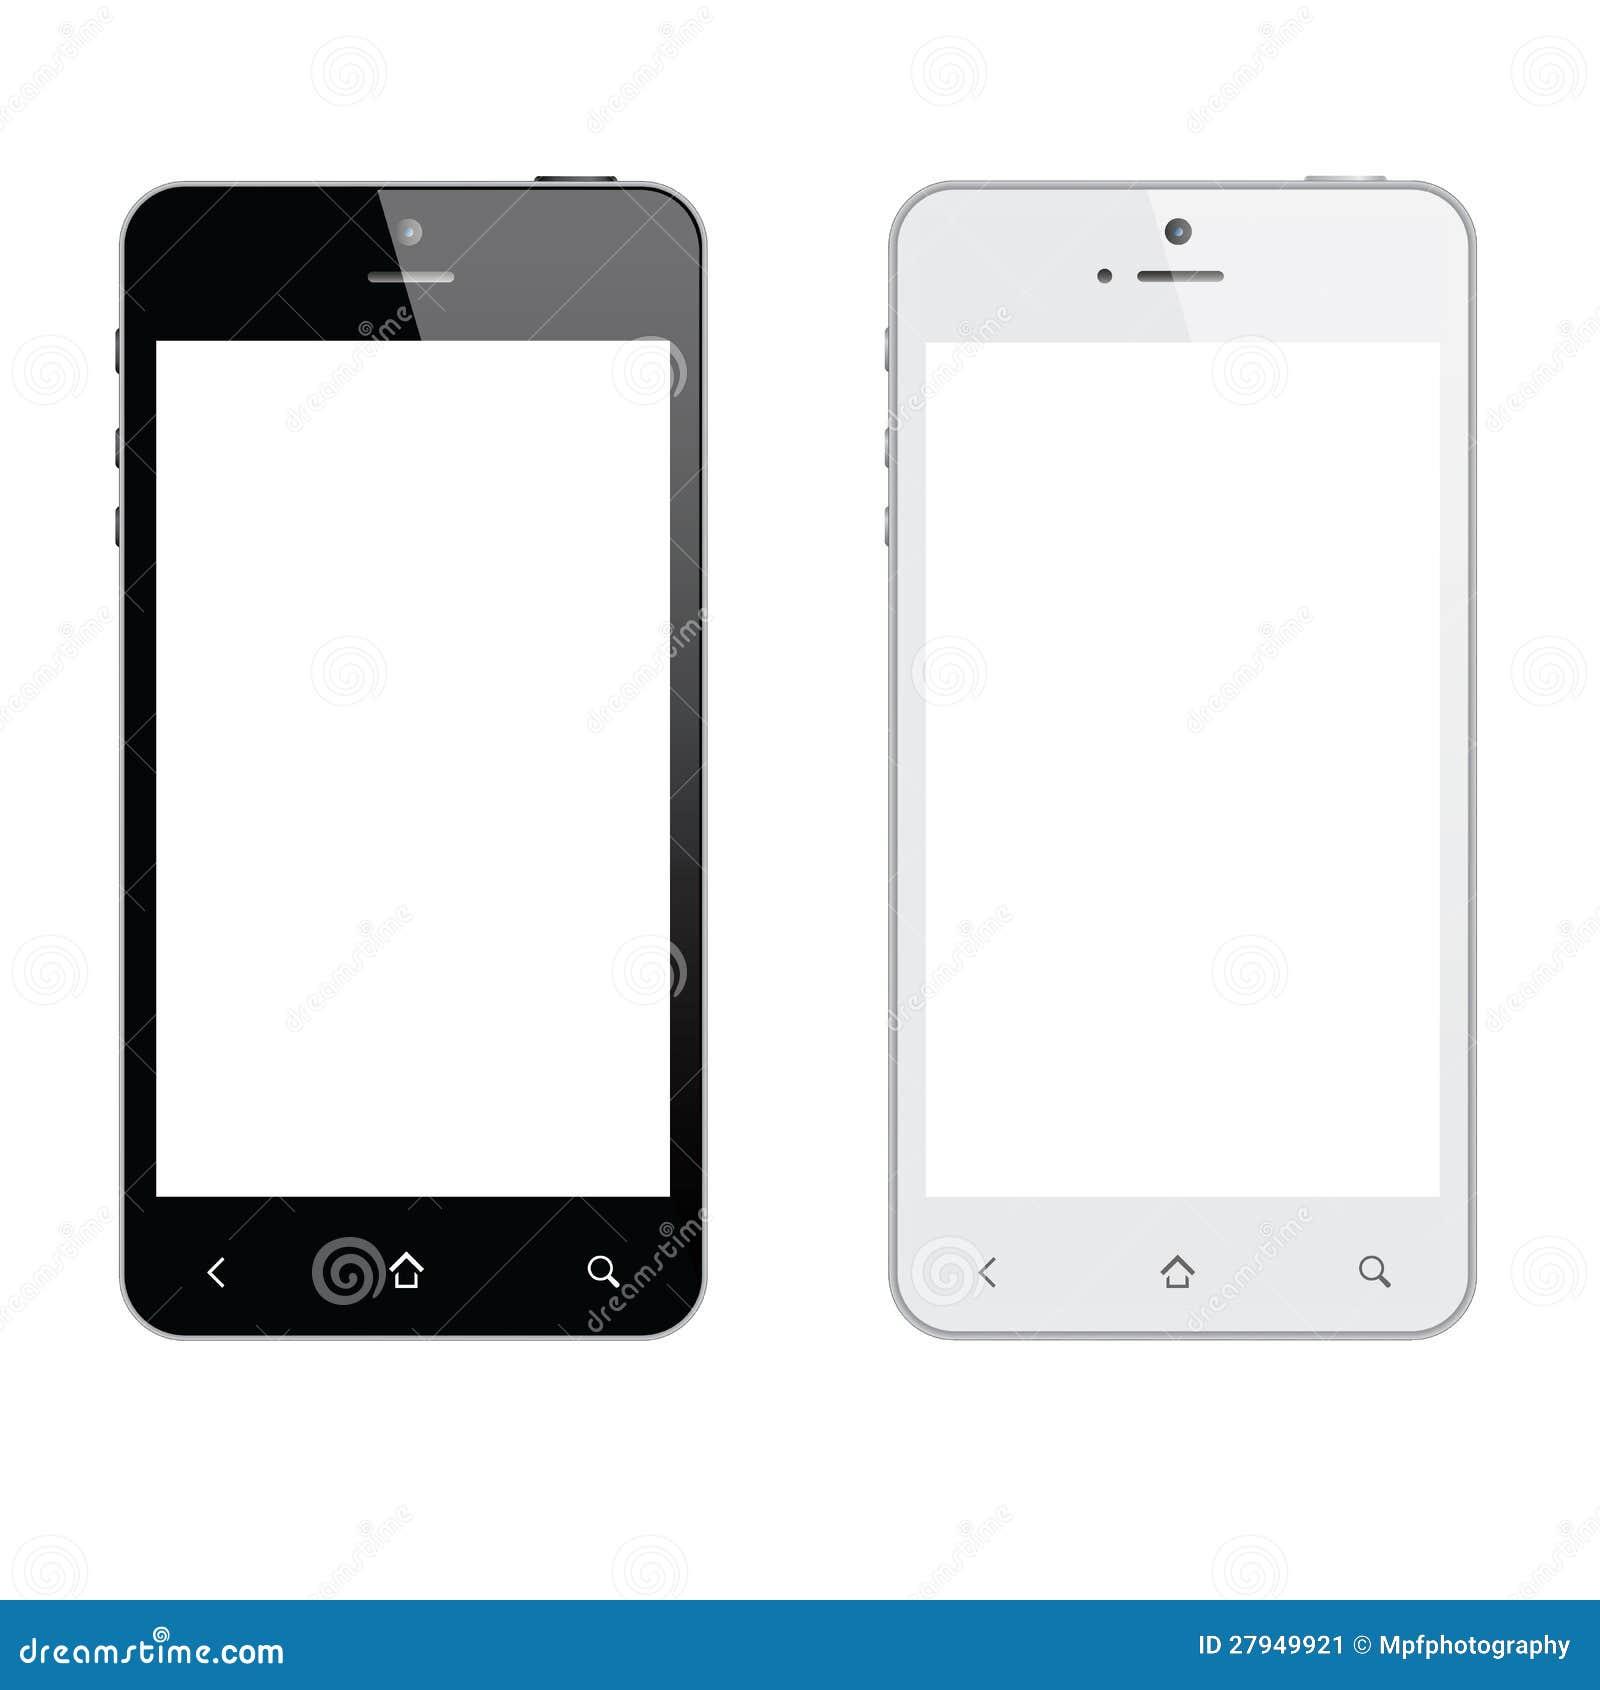 Samsung mobile communications business plan